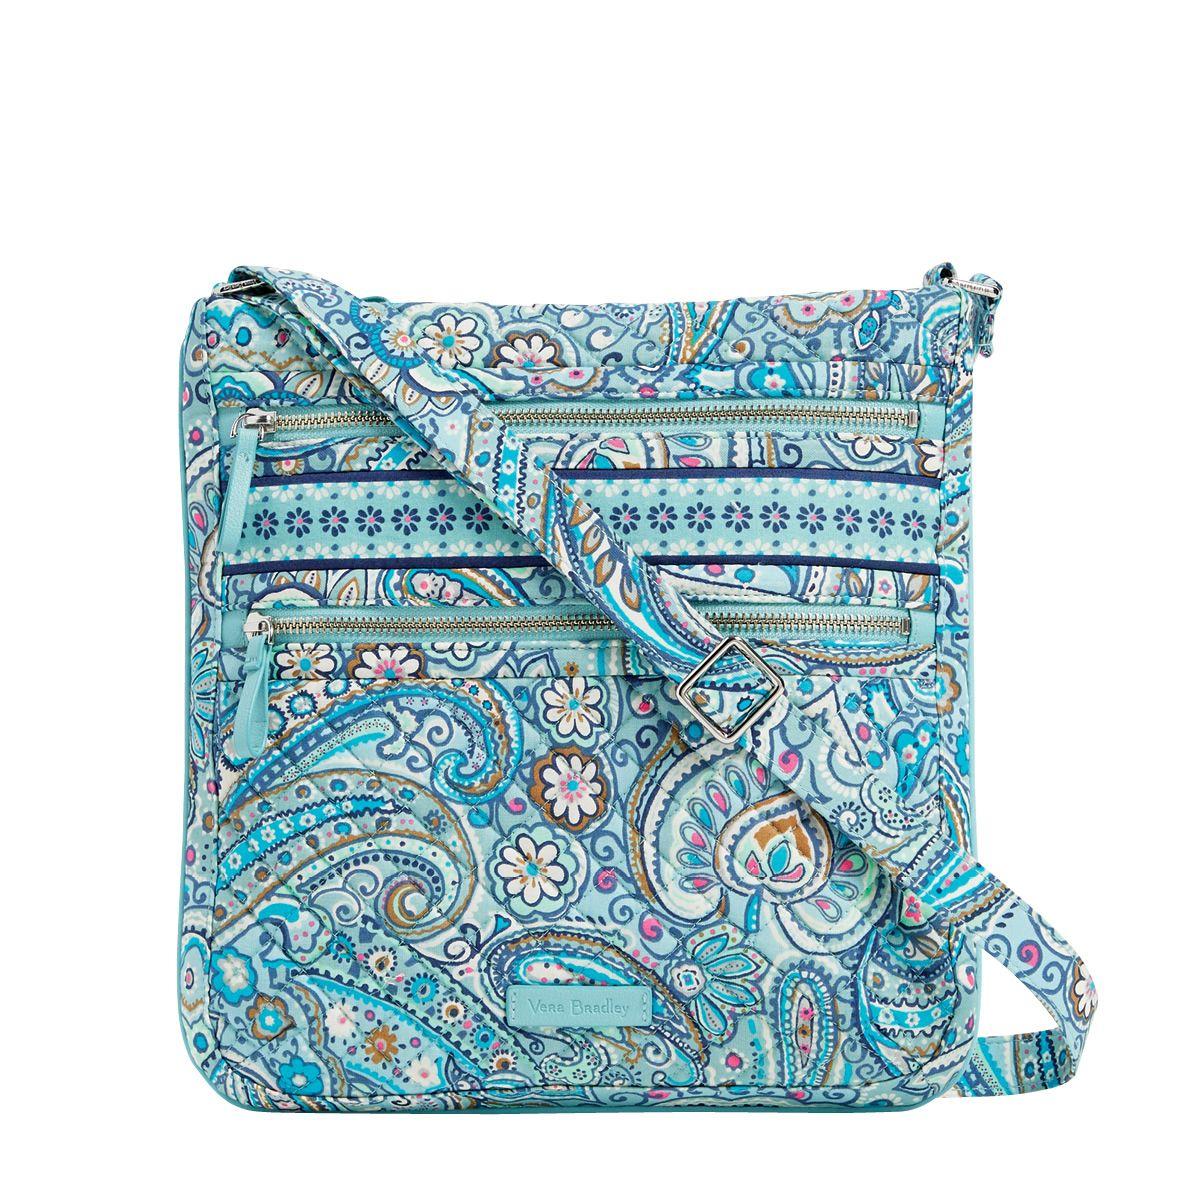 34cfb4c96 Vera Bradley Messenger Bags and Crossbody Bags - Macy's